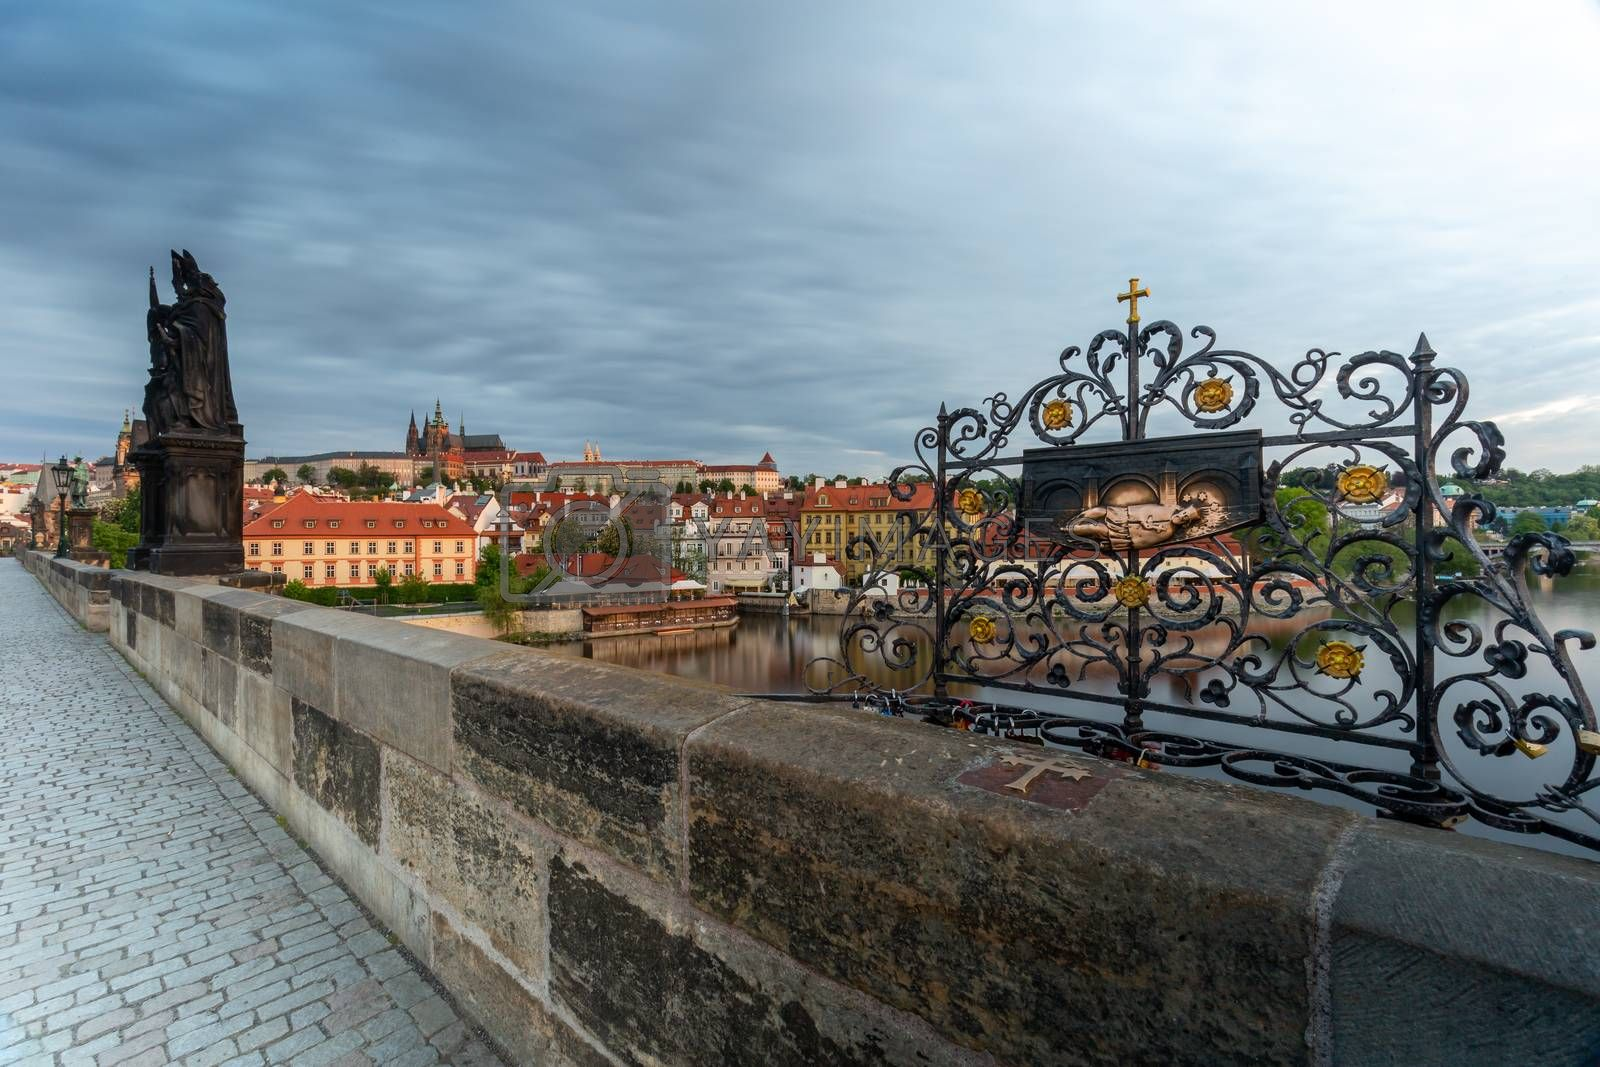 The place where Saint John Nepomuk was cast from the Charles Bridge into the Vltava river, Prague